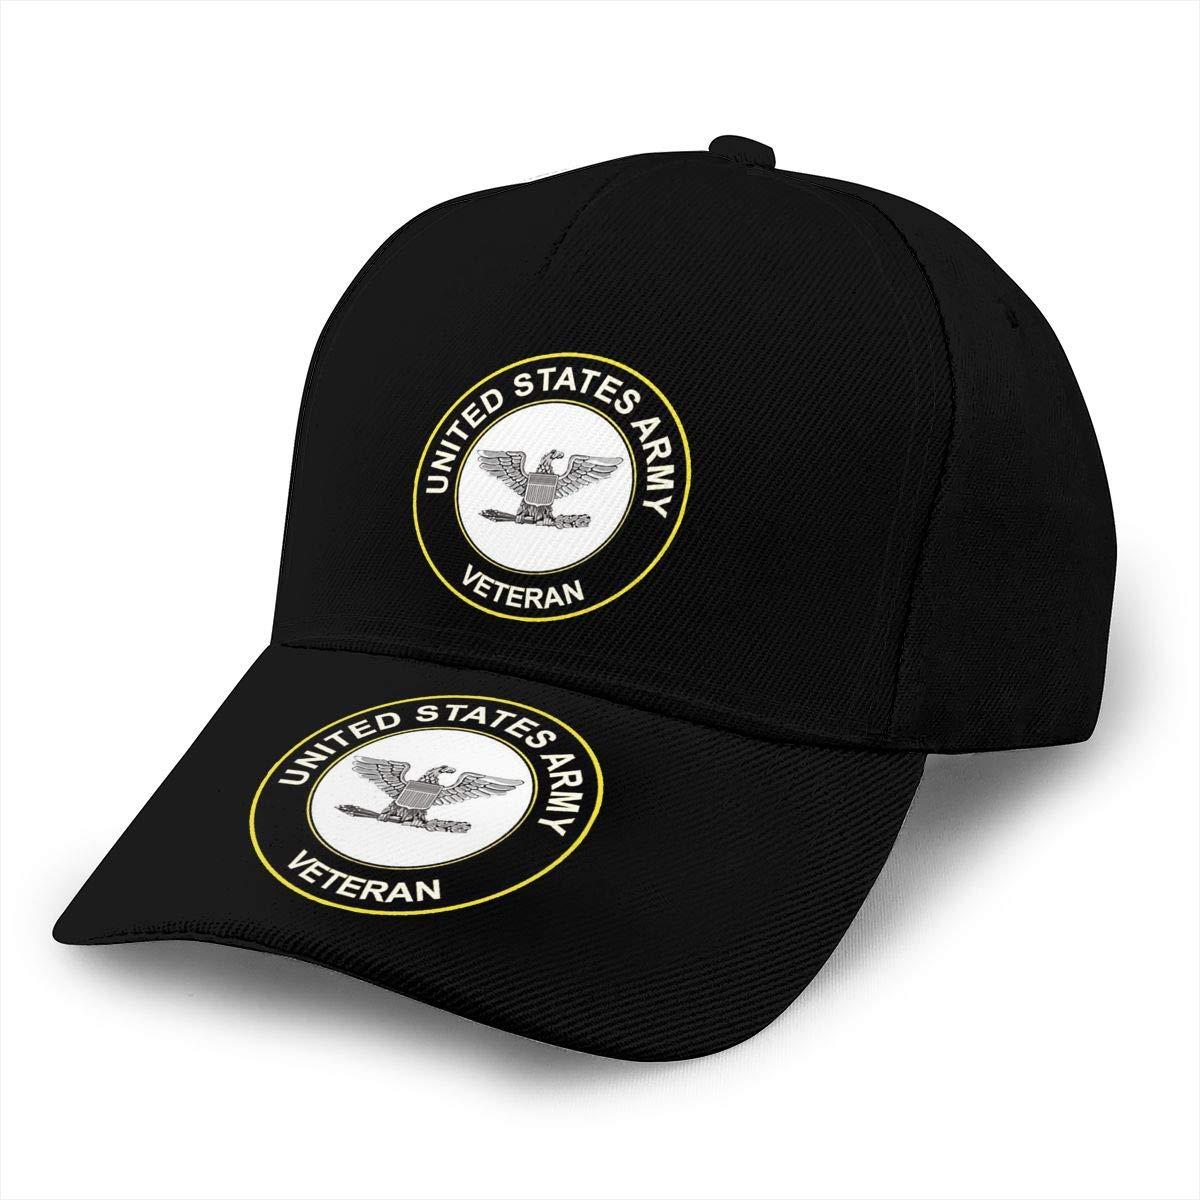 US Army Colonel Veteran Unisex Adult Hats Classic Baseball Caps Peaked Cap